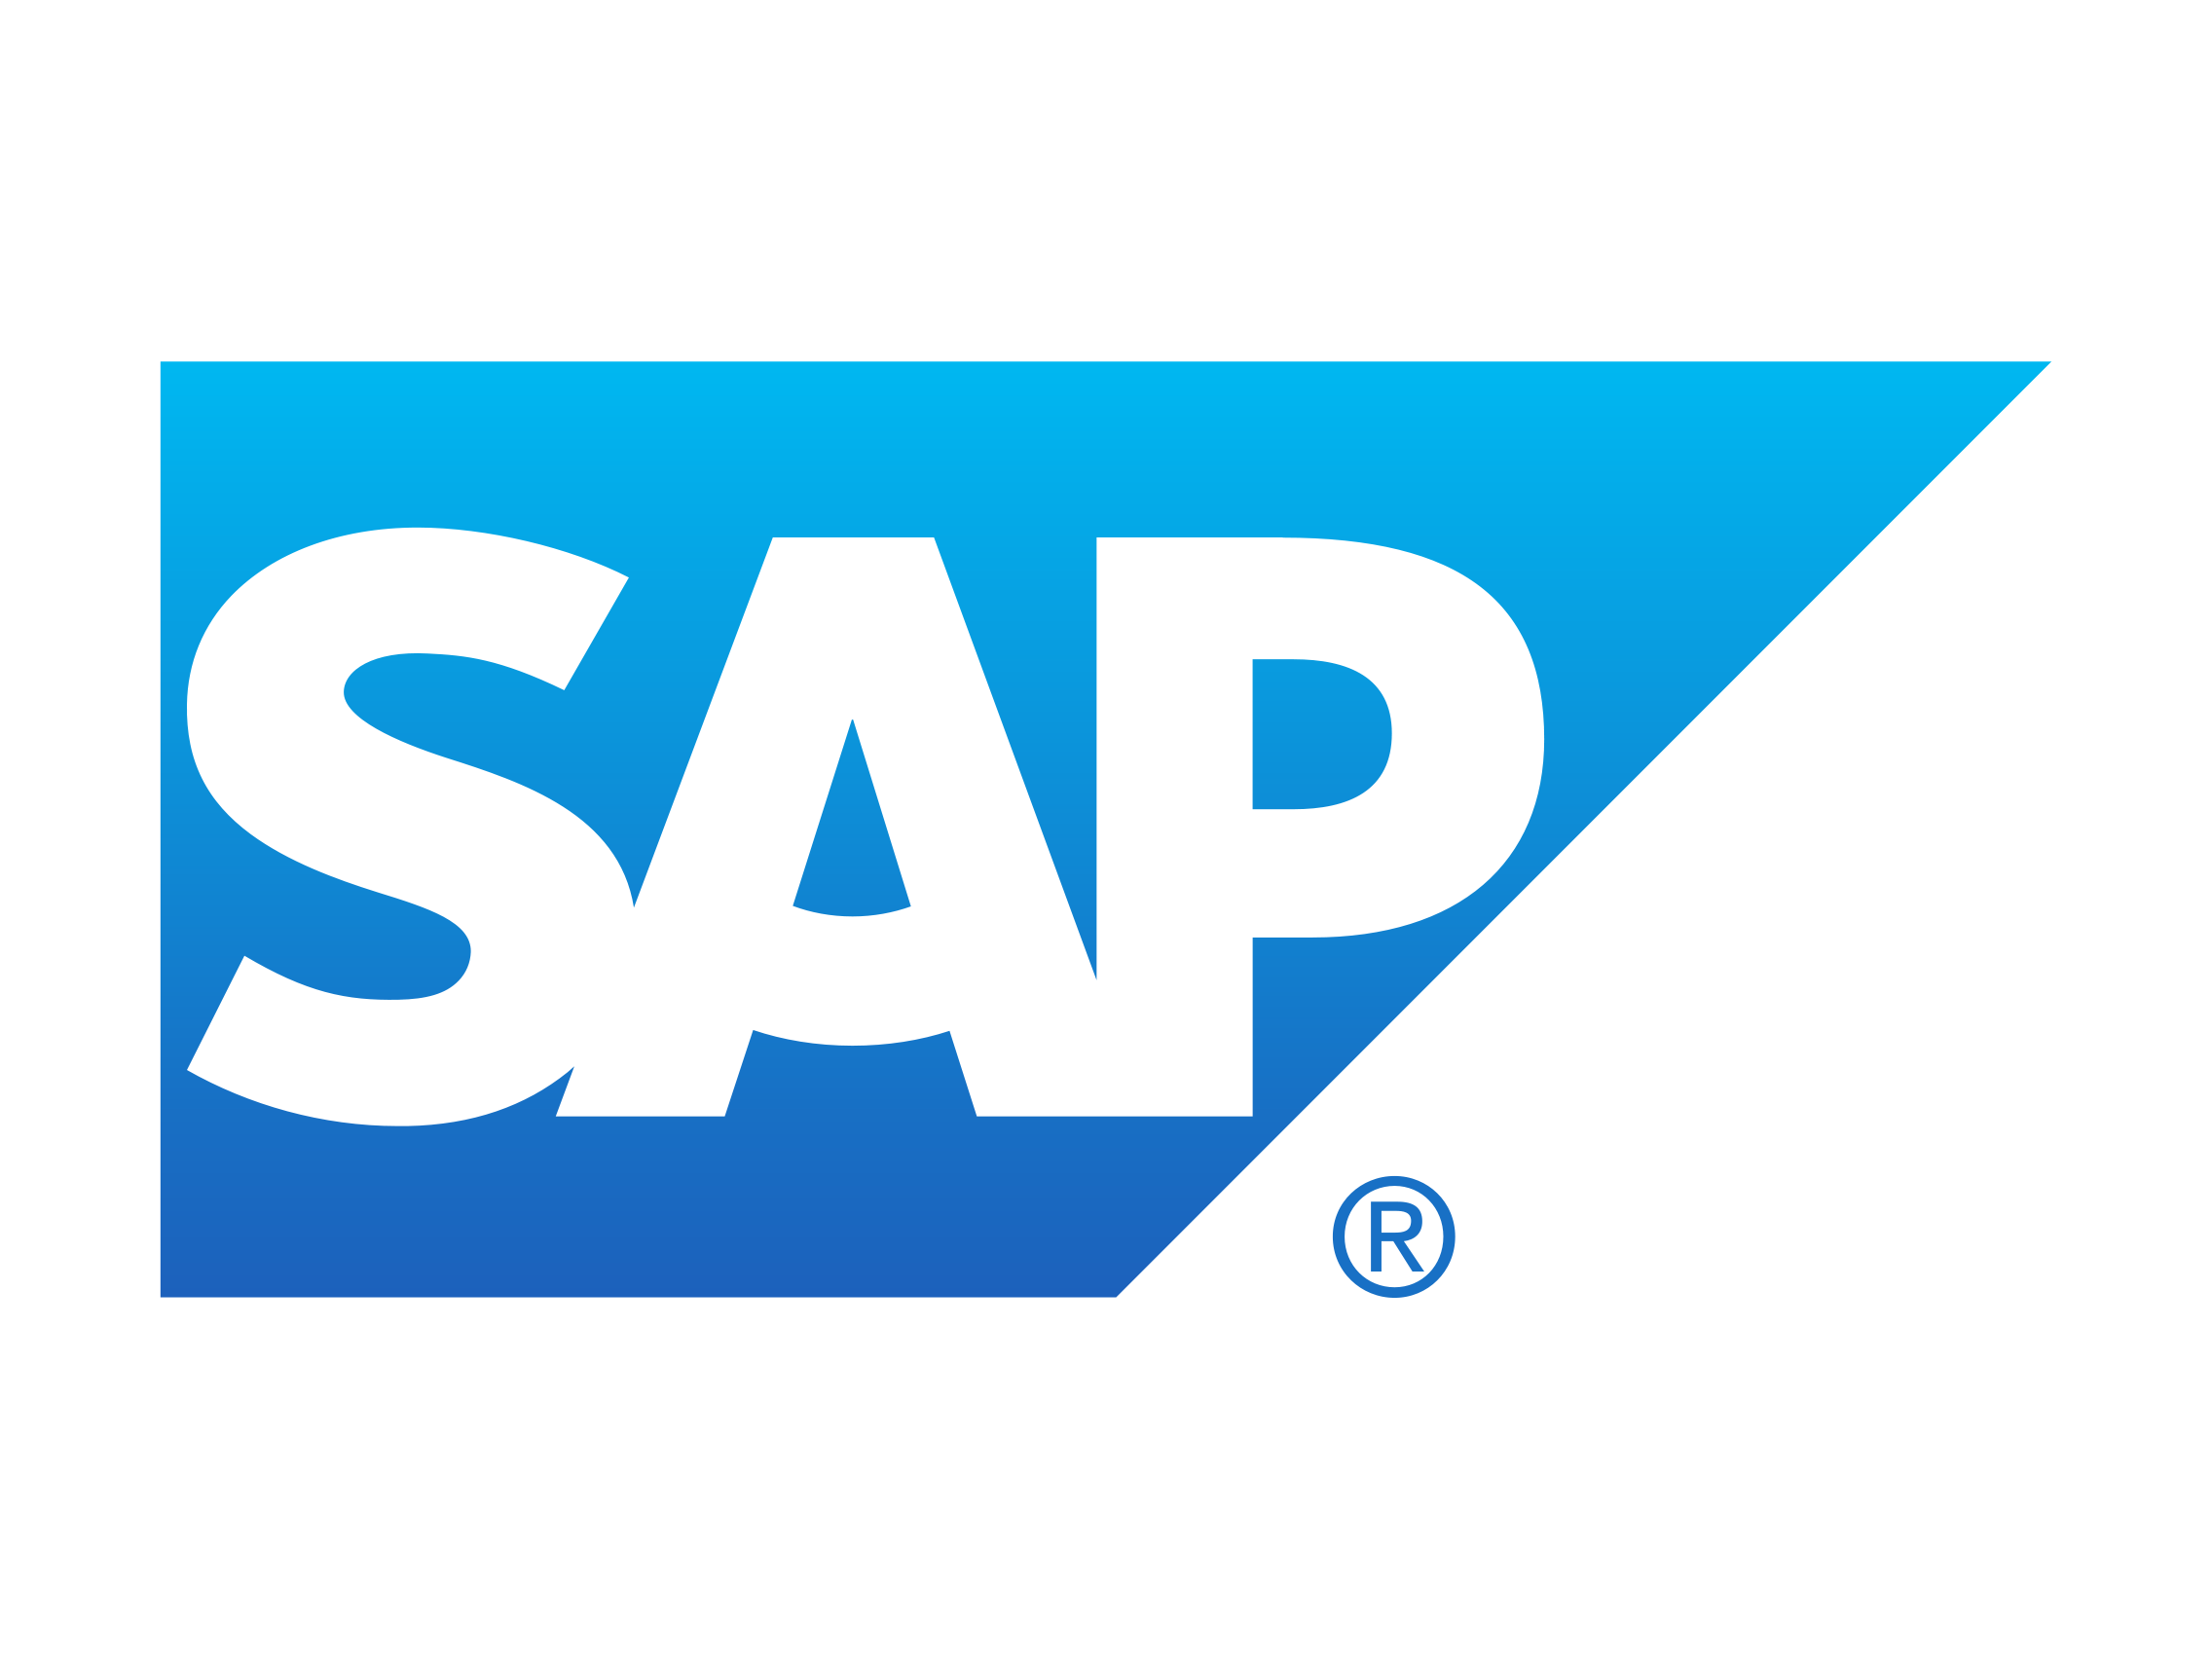 sap-logo-2011